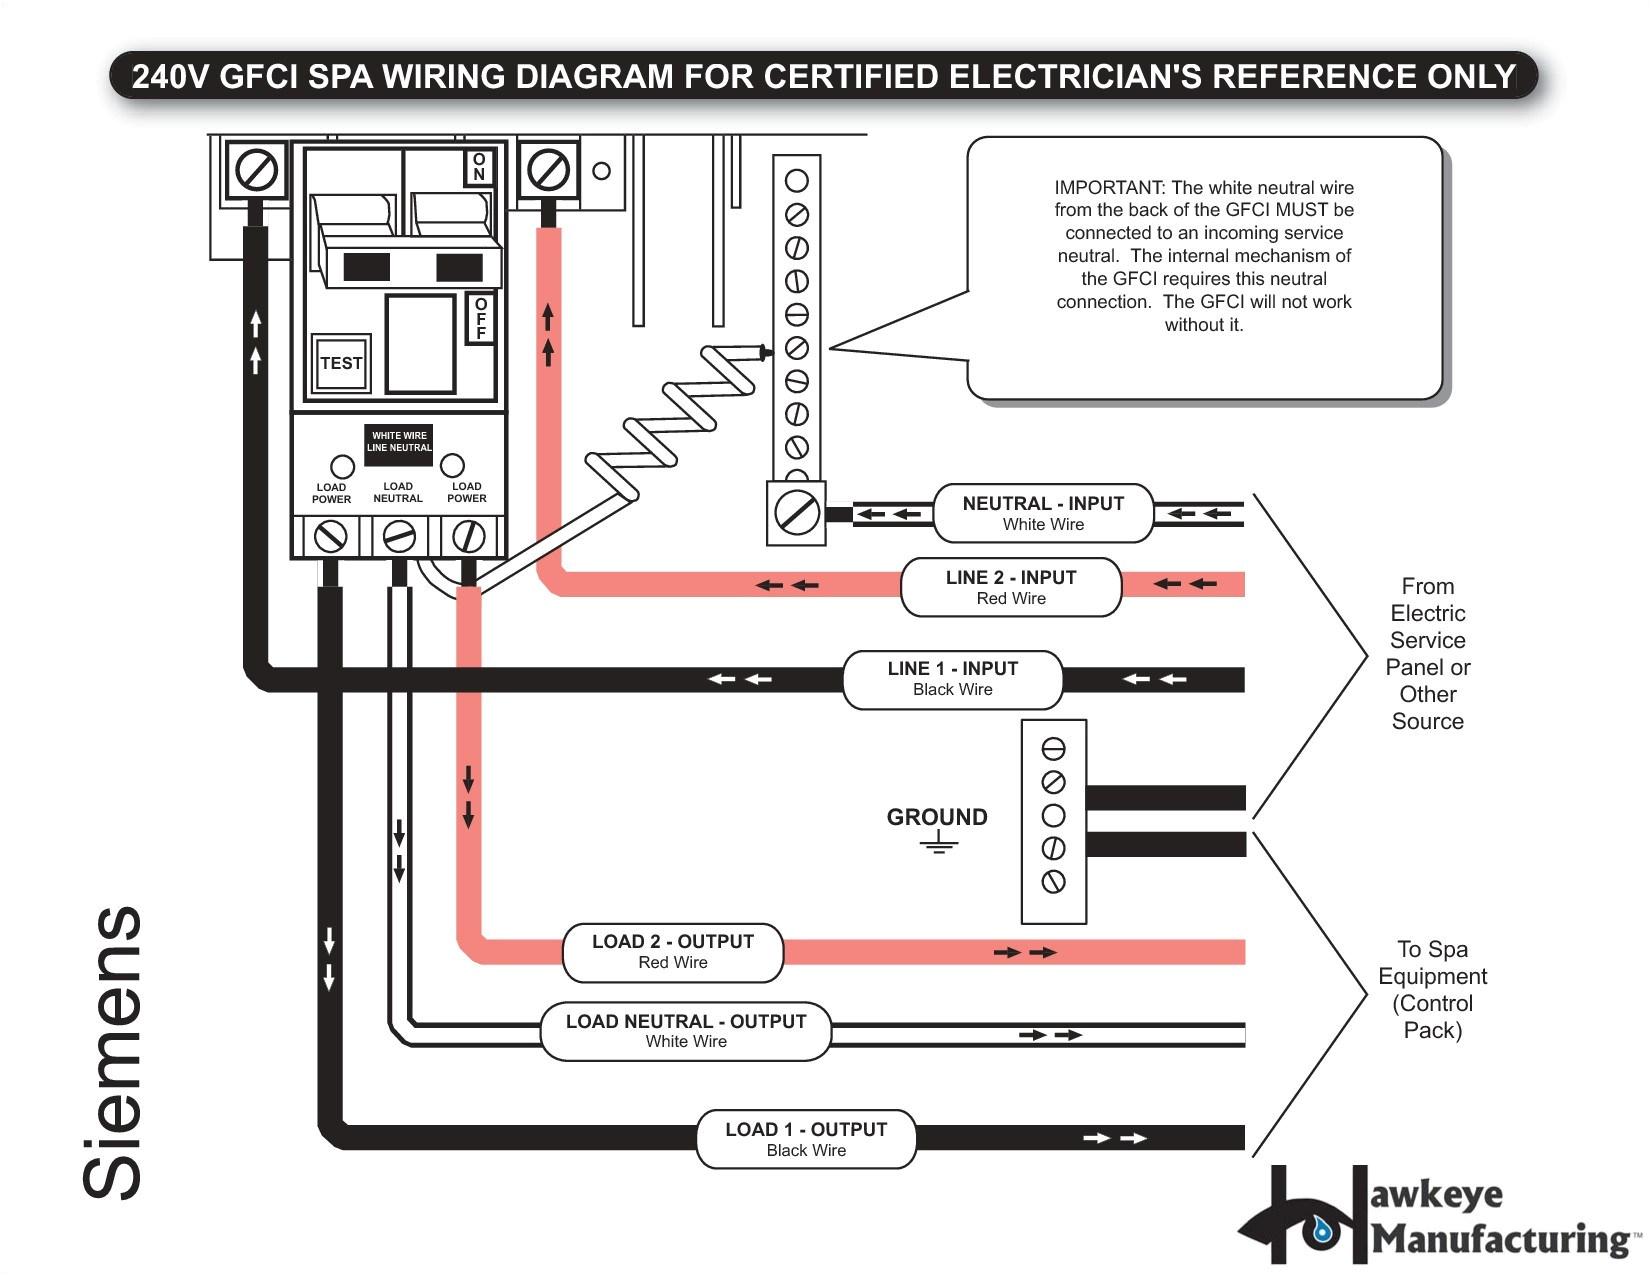 3 pole circuit breaker wiring diagram 3 pole circuit breaker wiring diagram perfect wiring diagram gfci outlet valid 2 pole gfci breaker wiring diagram 13c jpg